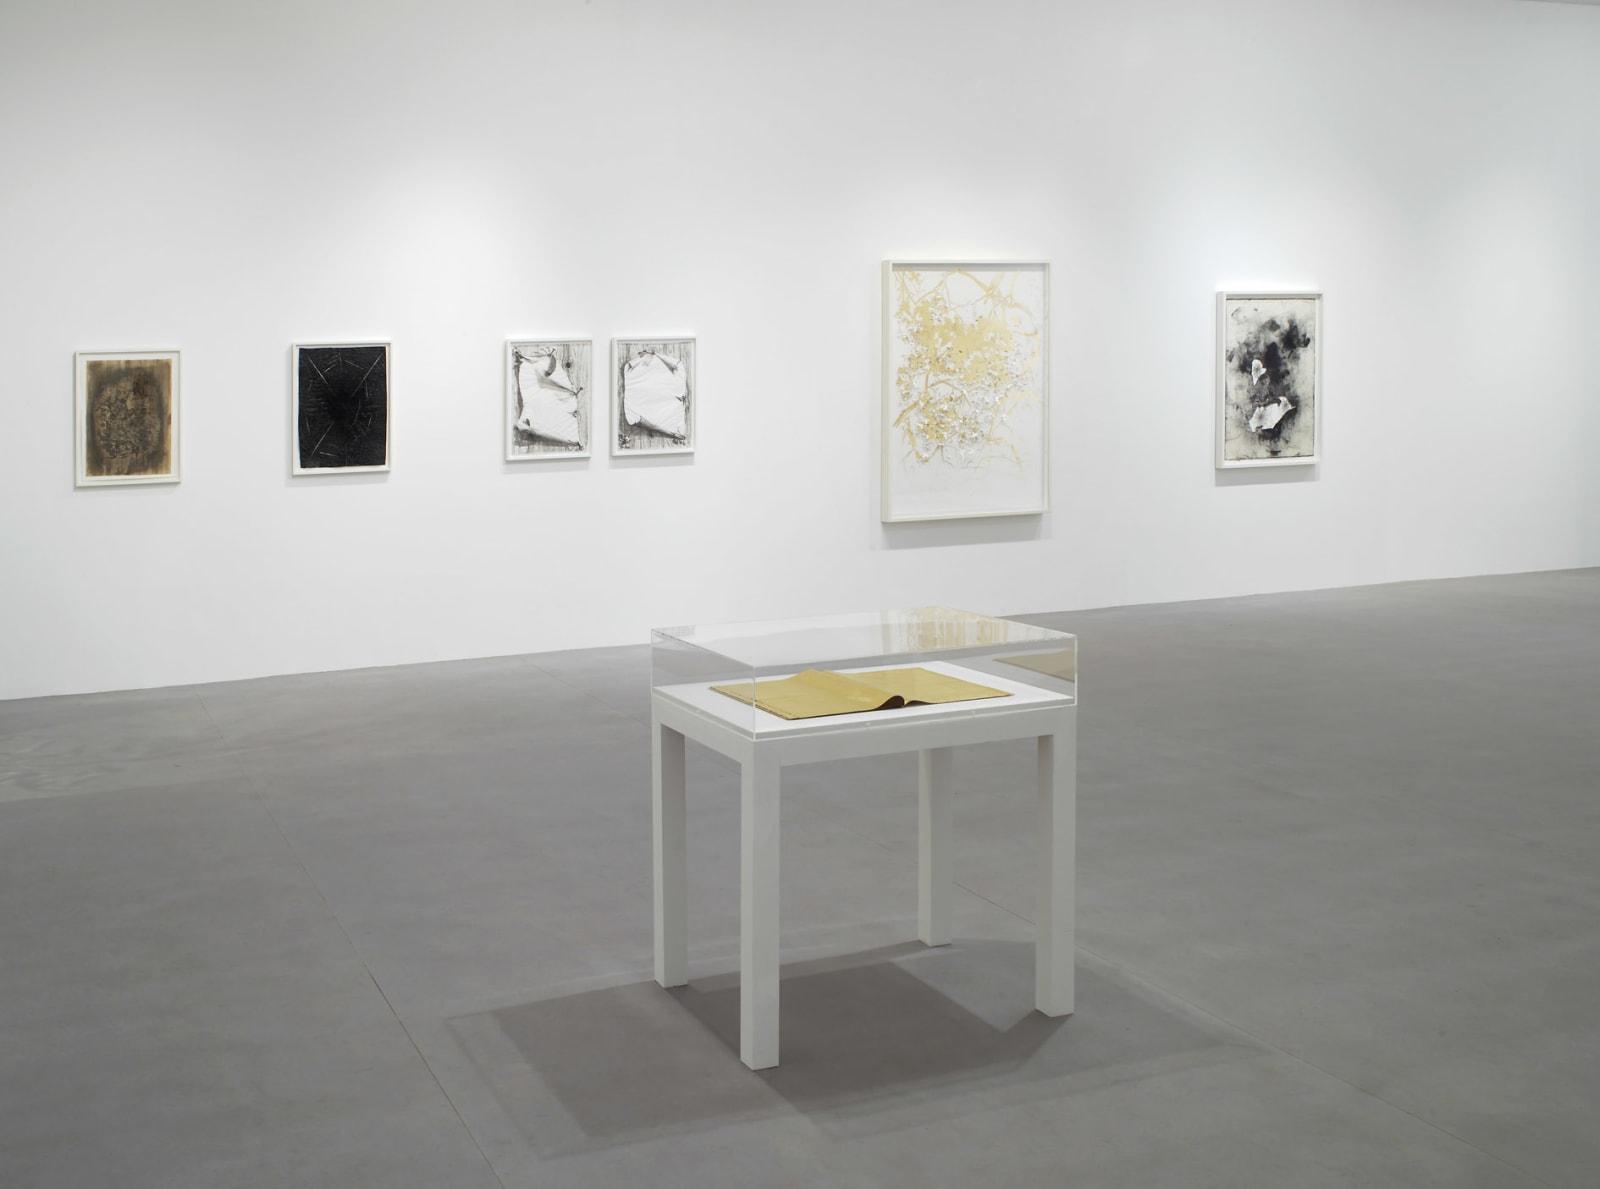 <p><span>Installation view: 'Love et cetera'</span><span>, Camden Art Centre, London (2010)</span></p>